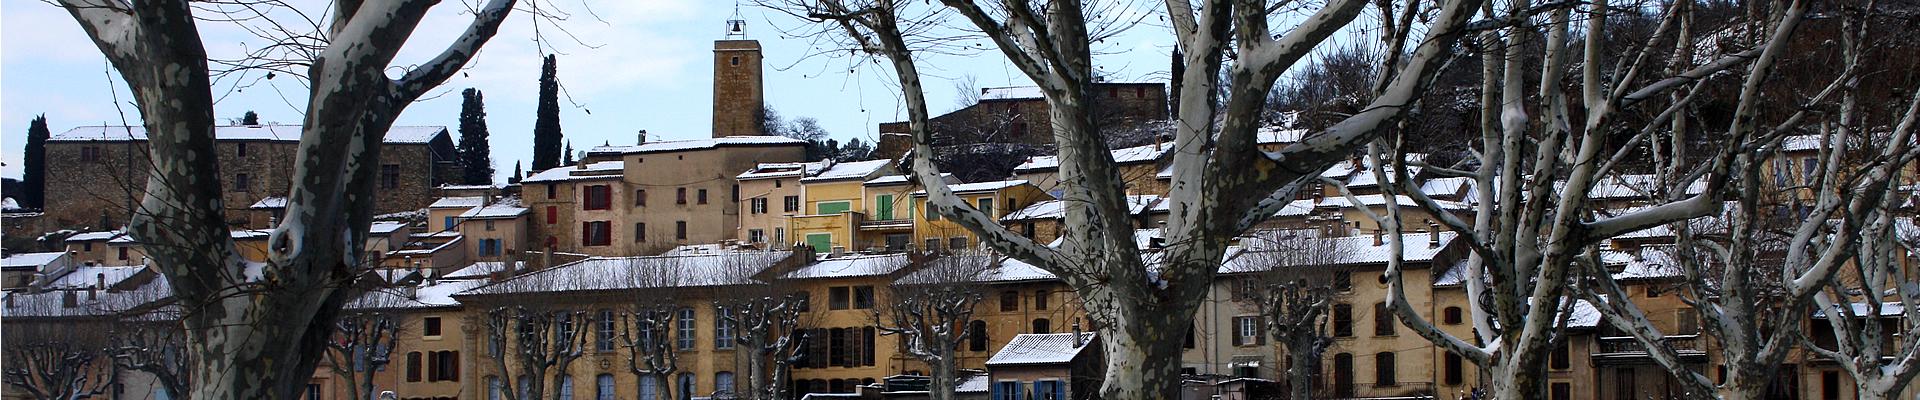 portail_village_neige_IMG_3669